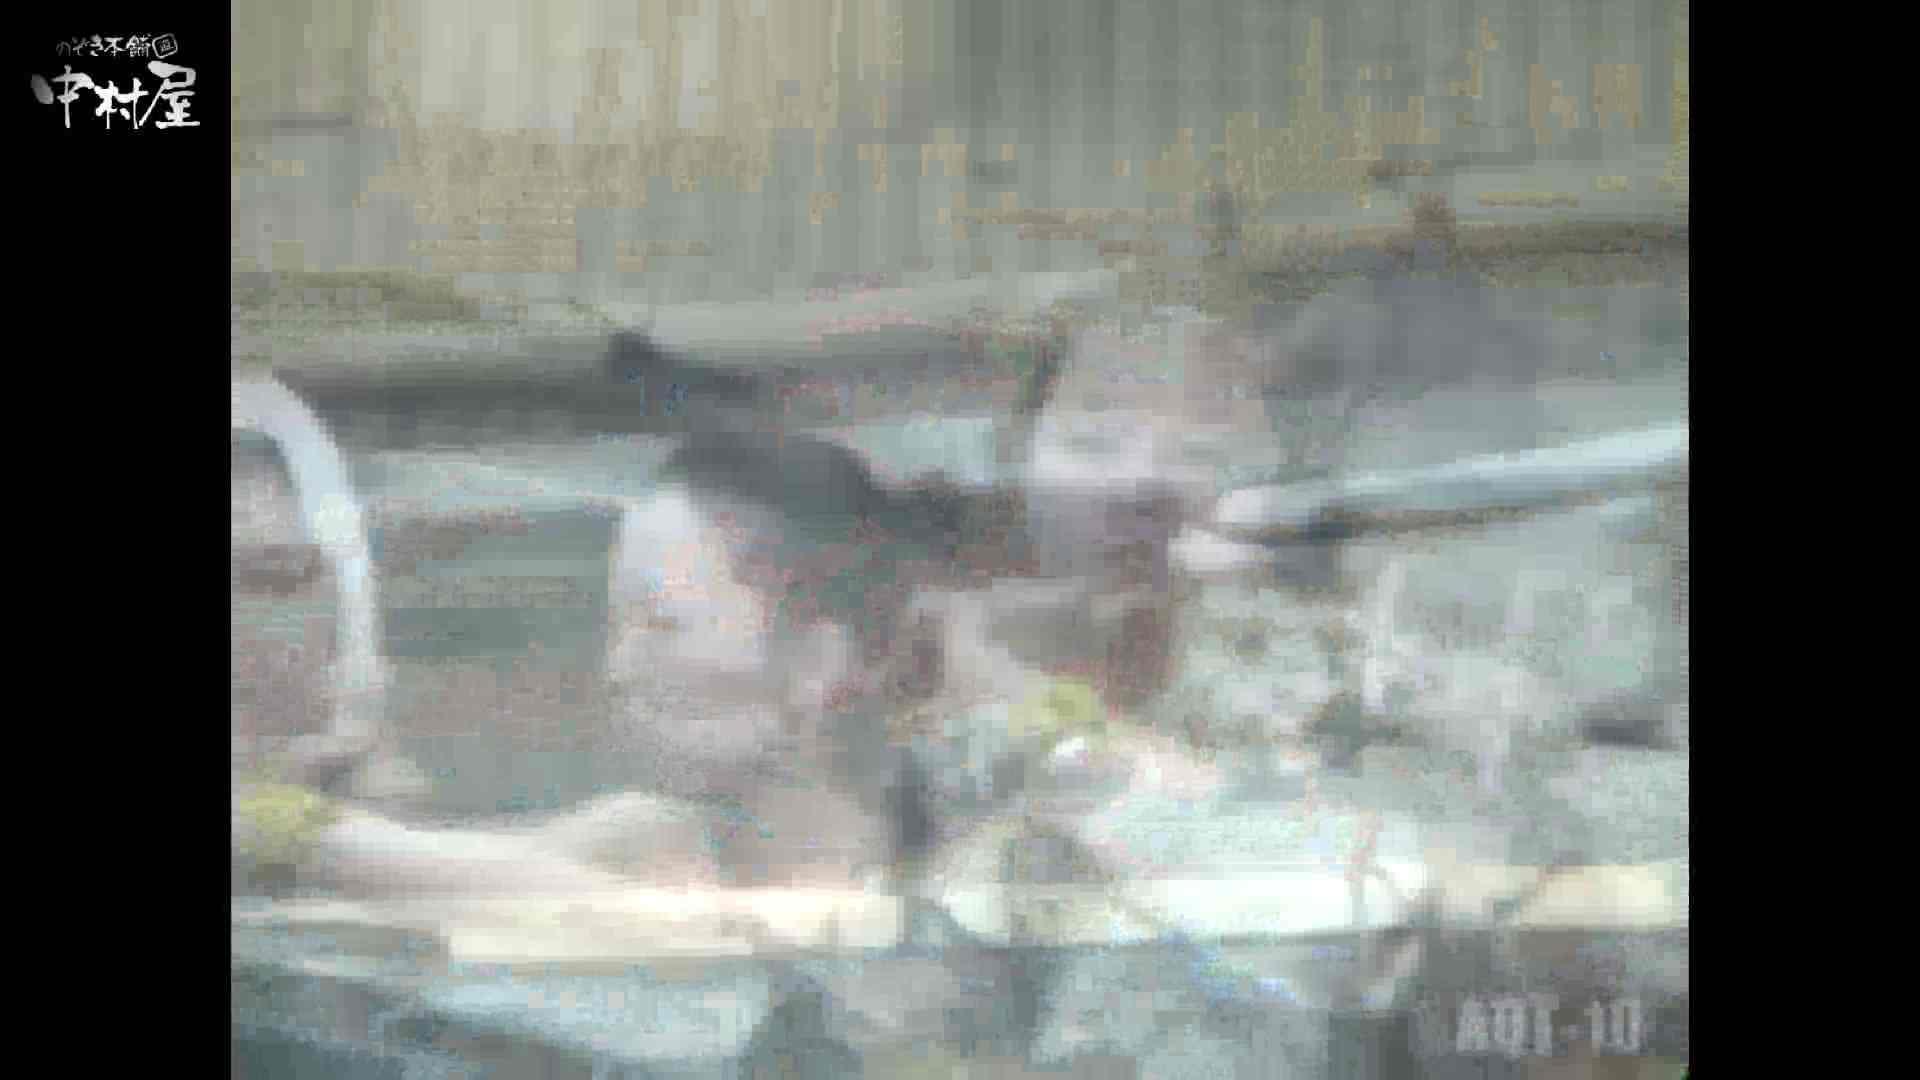 Aquaな露天風呂Vol.874潜入盗撮露天風呂十判湯 其の三 0   0  63pic 51